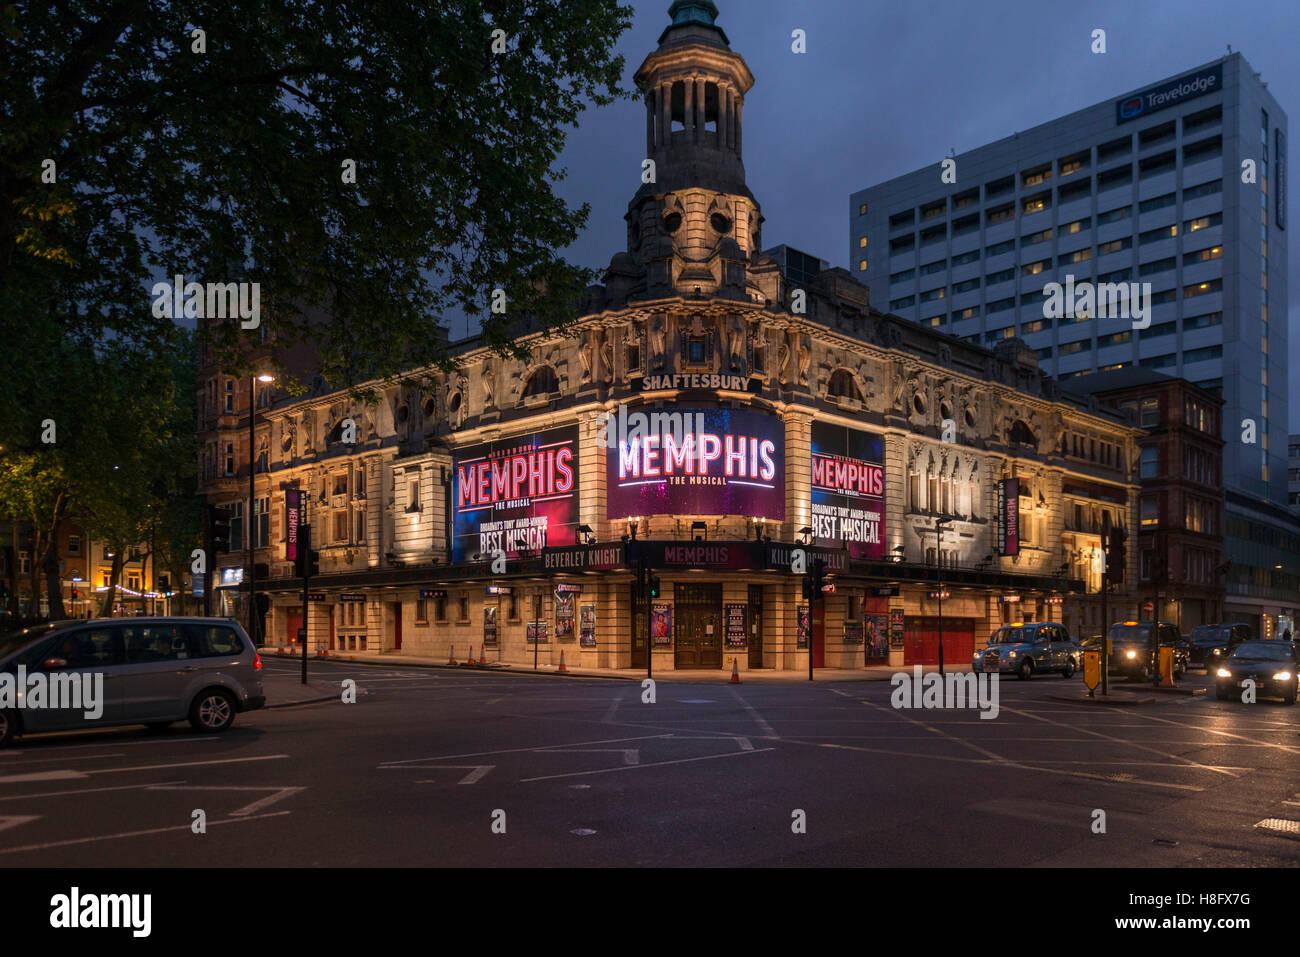 England, London, Shaftesbury Theatre, 210 Shaftesbury Avenue. - Stock Image